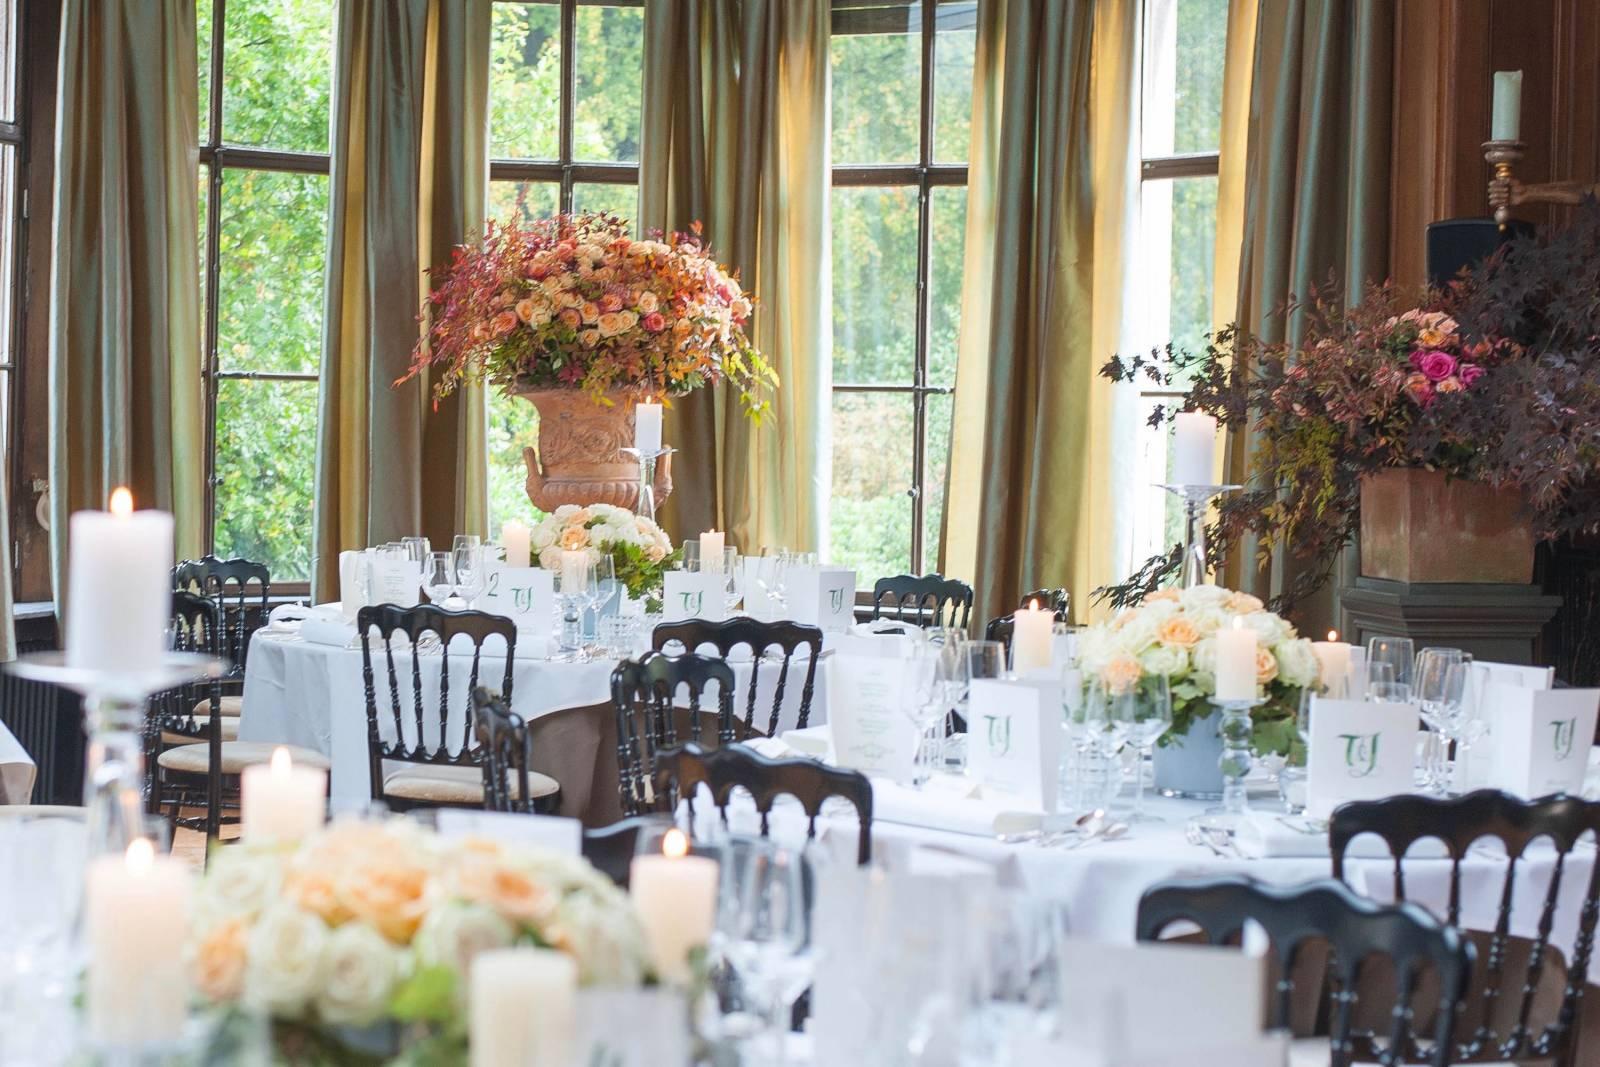 Wolvenbos - House of Weddings  - 27